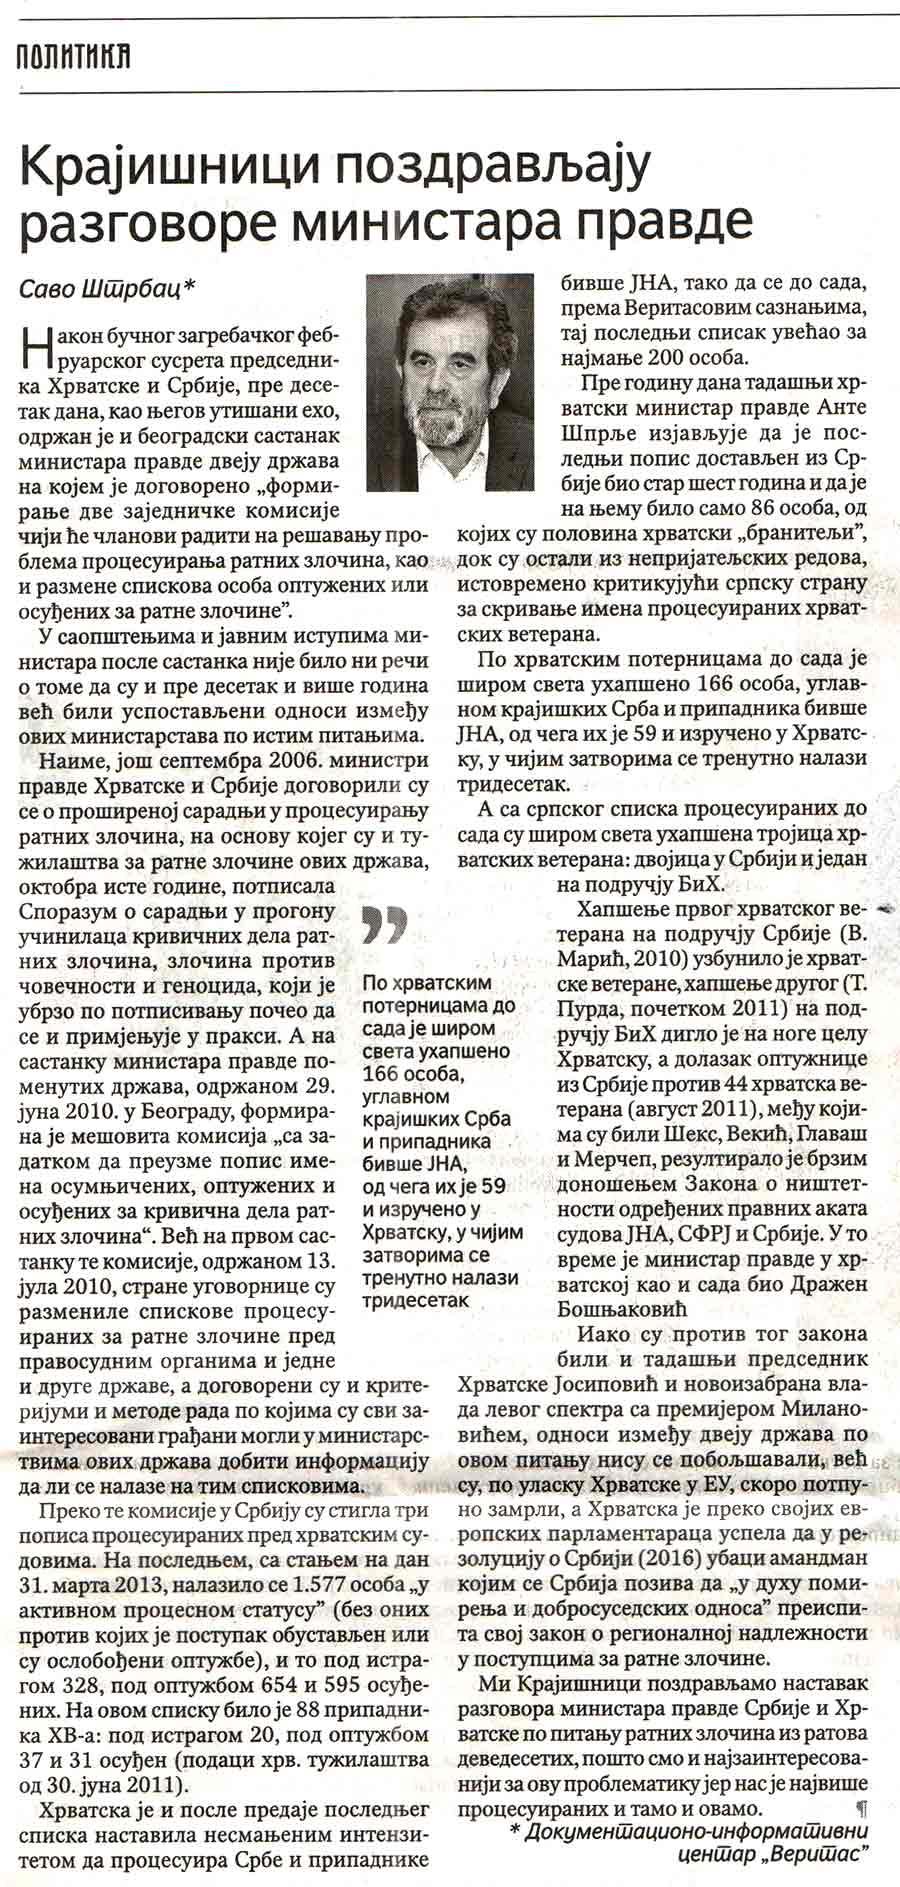 Politika, 04.04.2018, Krajišnici pozdravljaju razgovore ministara pravde